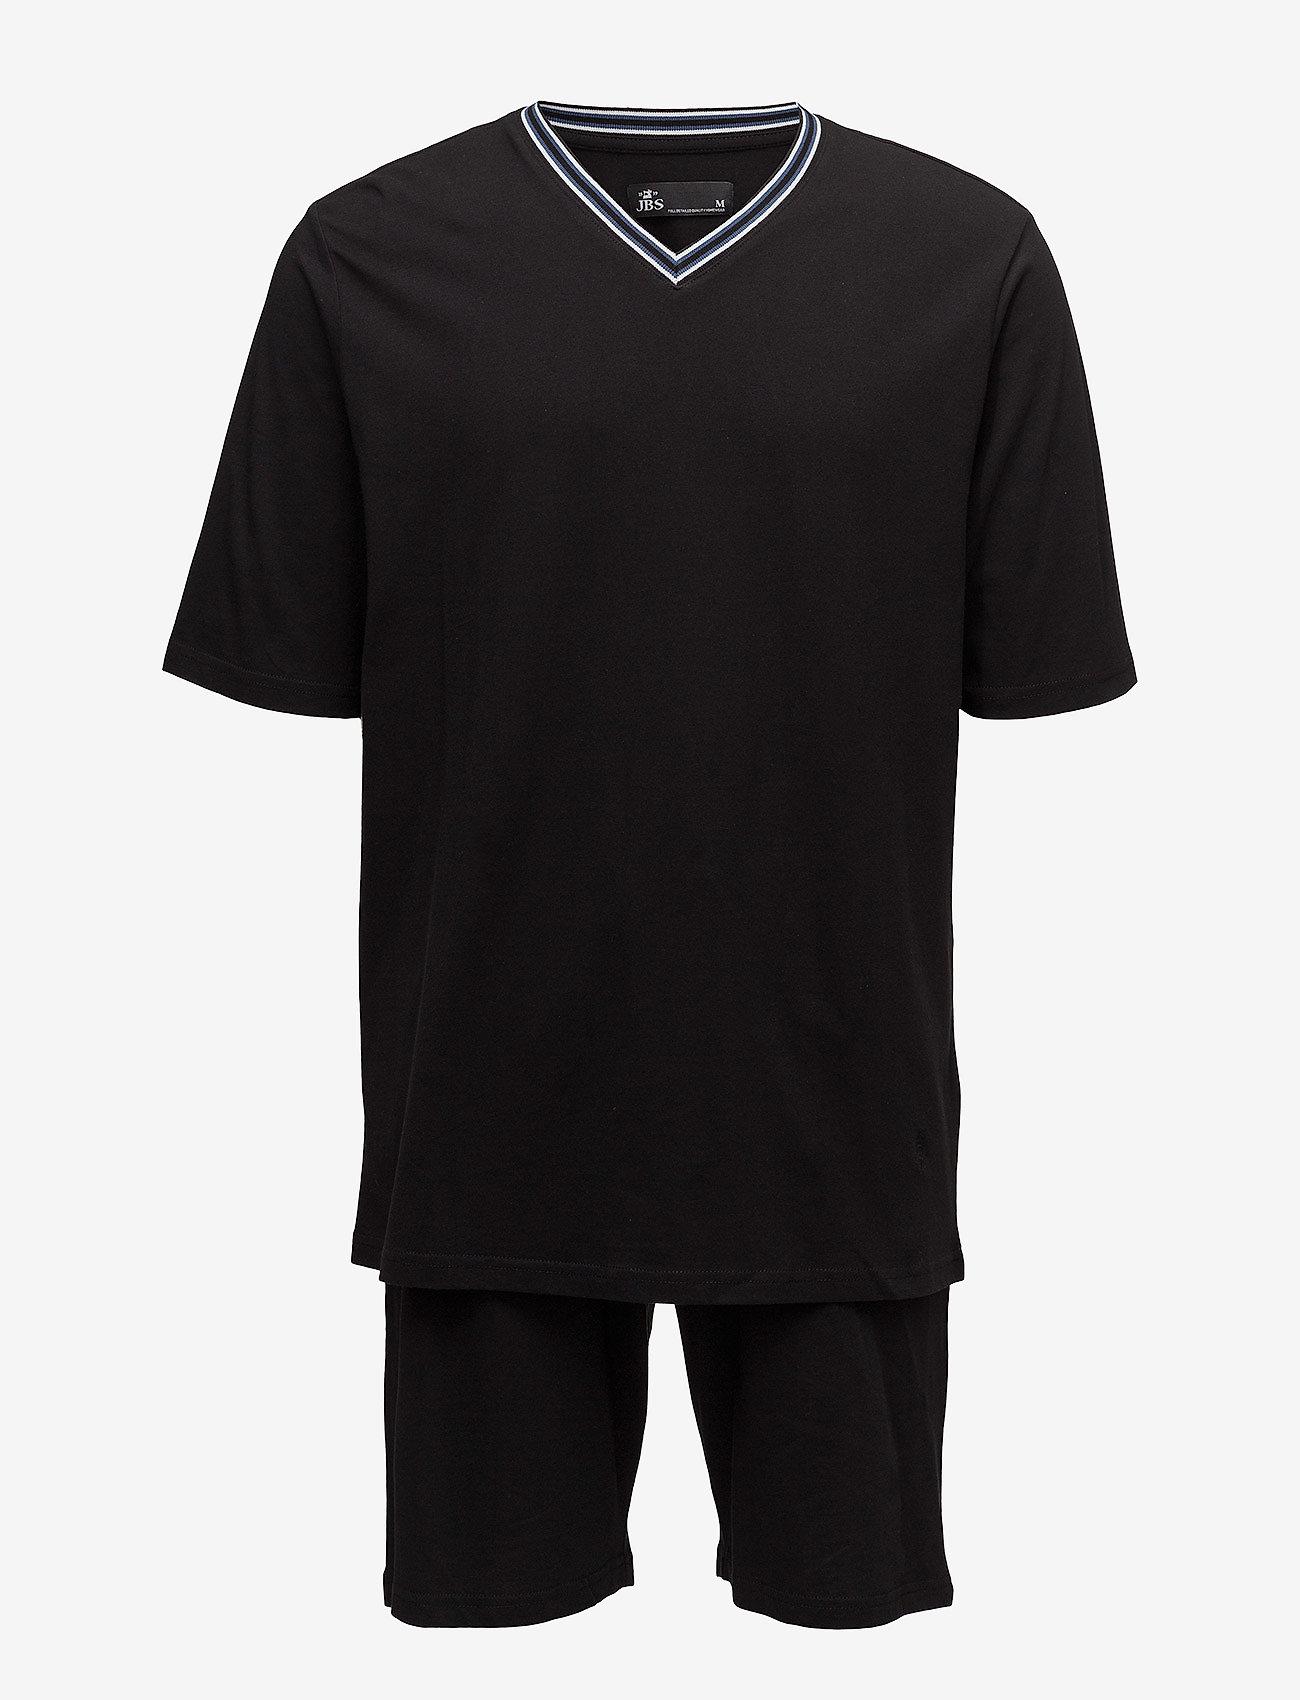 JBS - JBS pajamas, t-shirt-shorts - pyjamas - black - 0